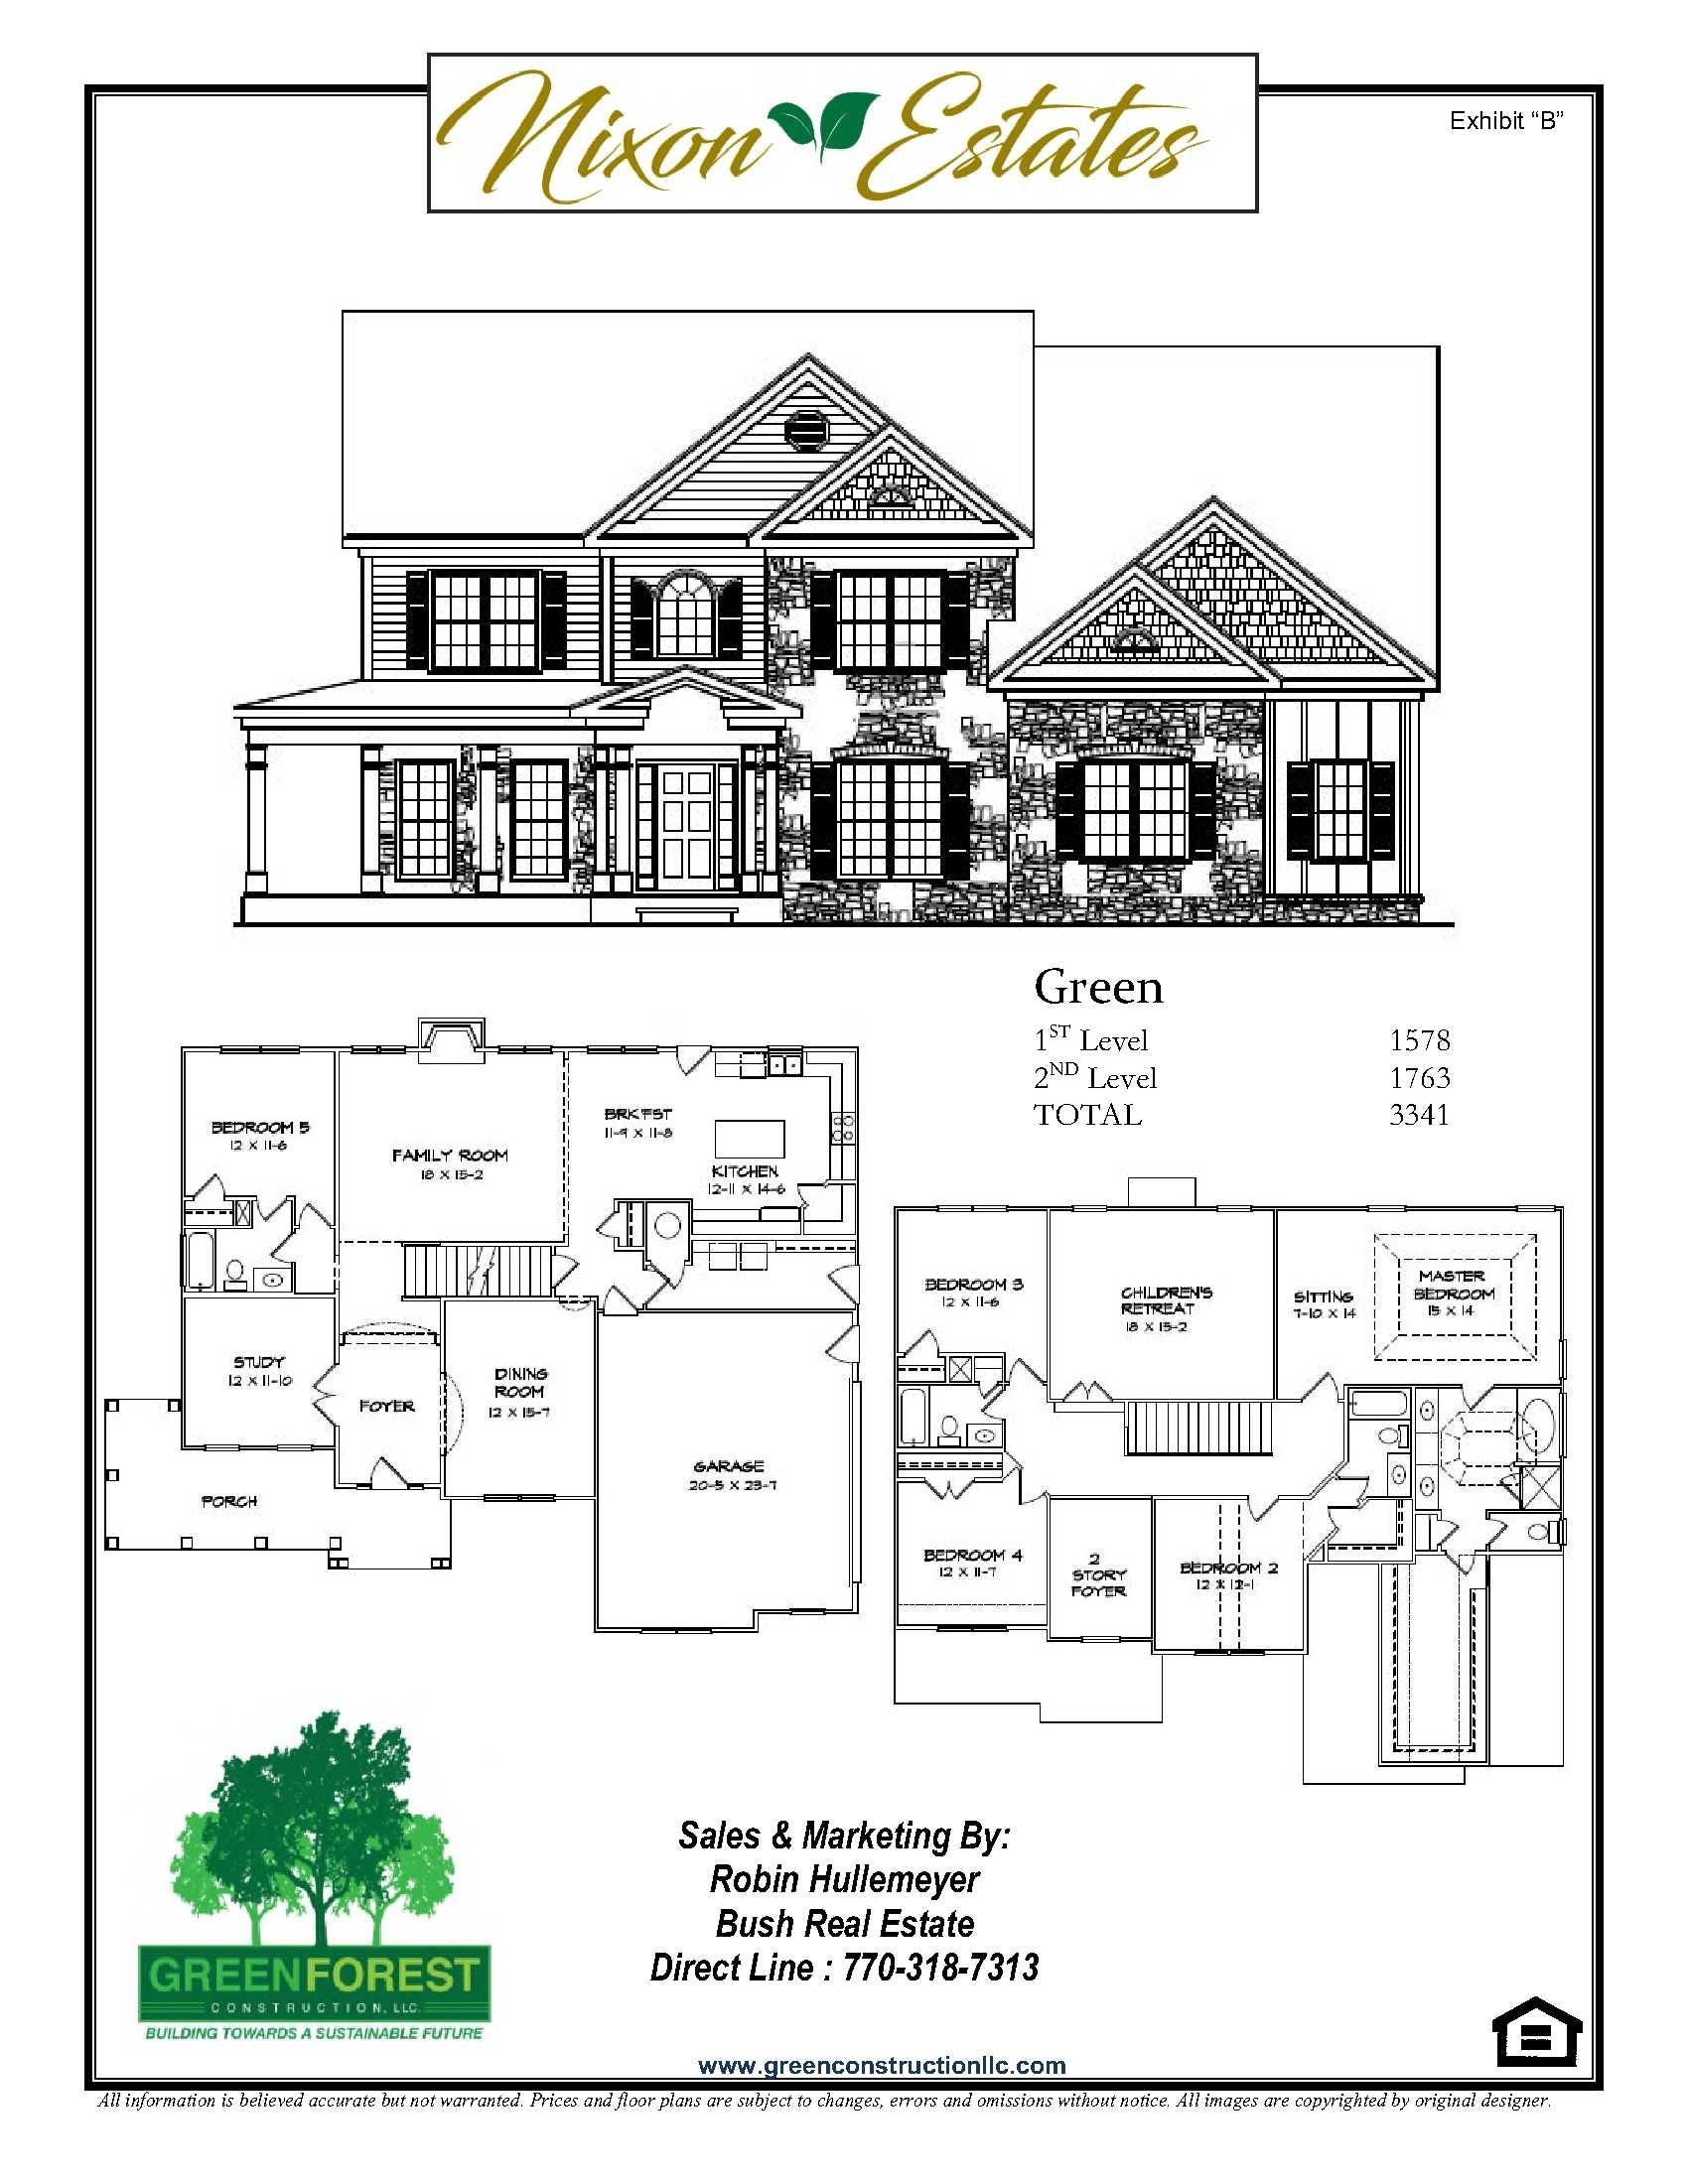 03.13.17 - Nixon Estates Full Package_7.jpg